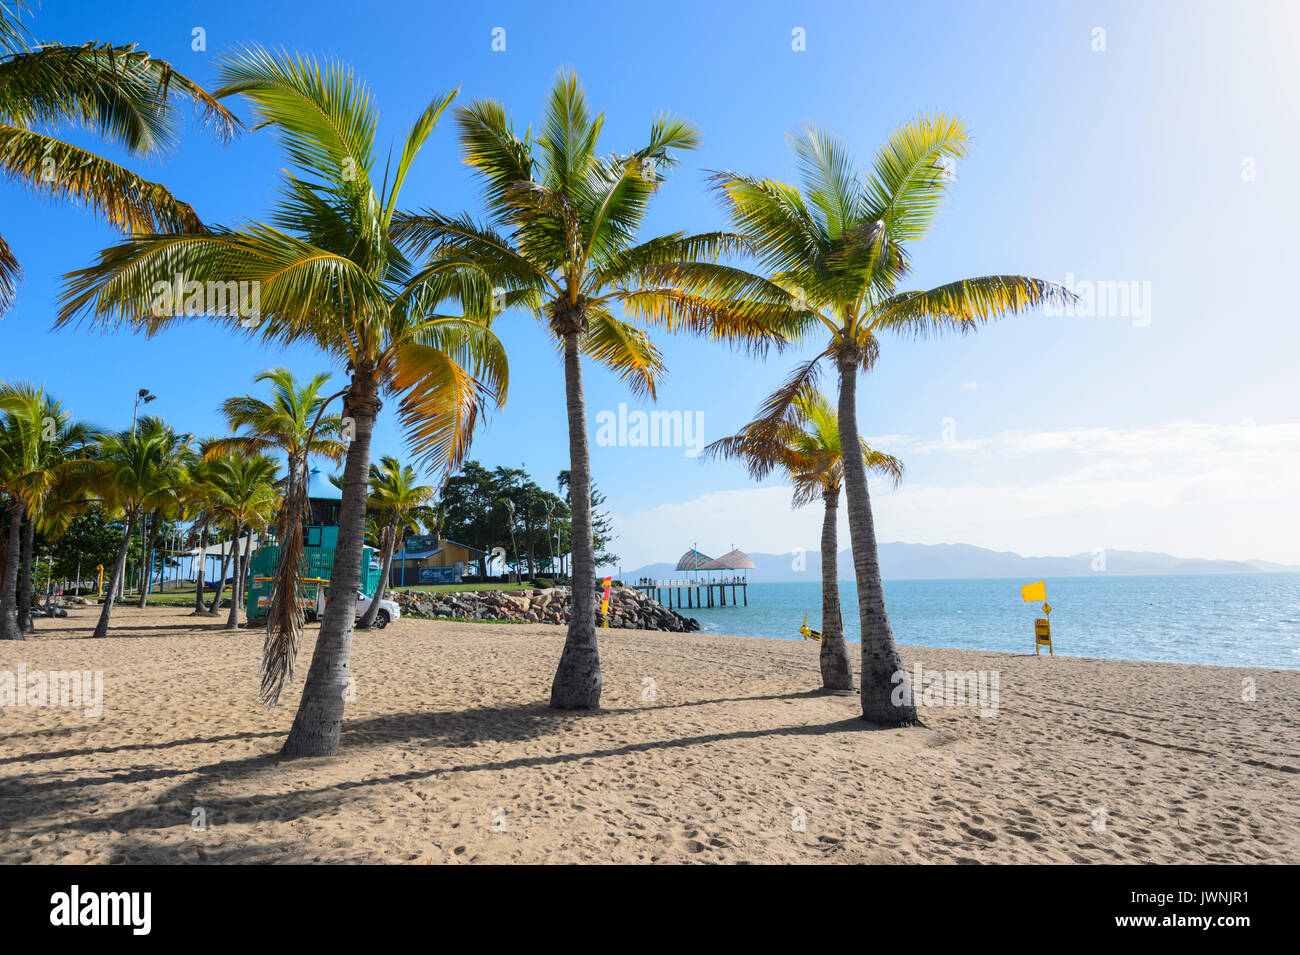 Pintoresca playa tropical con palmeras, Townsville, Queensland, Queensland, Australia Foto de stock